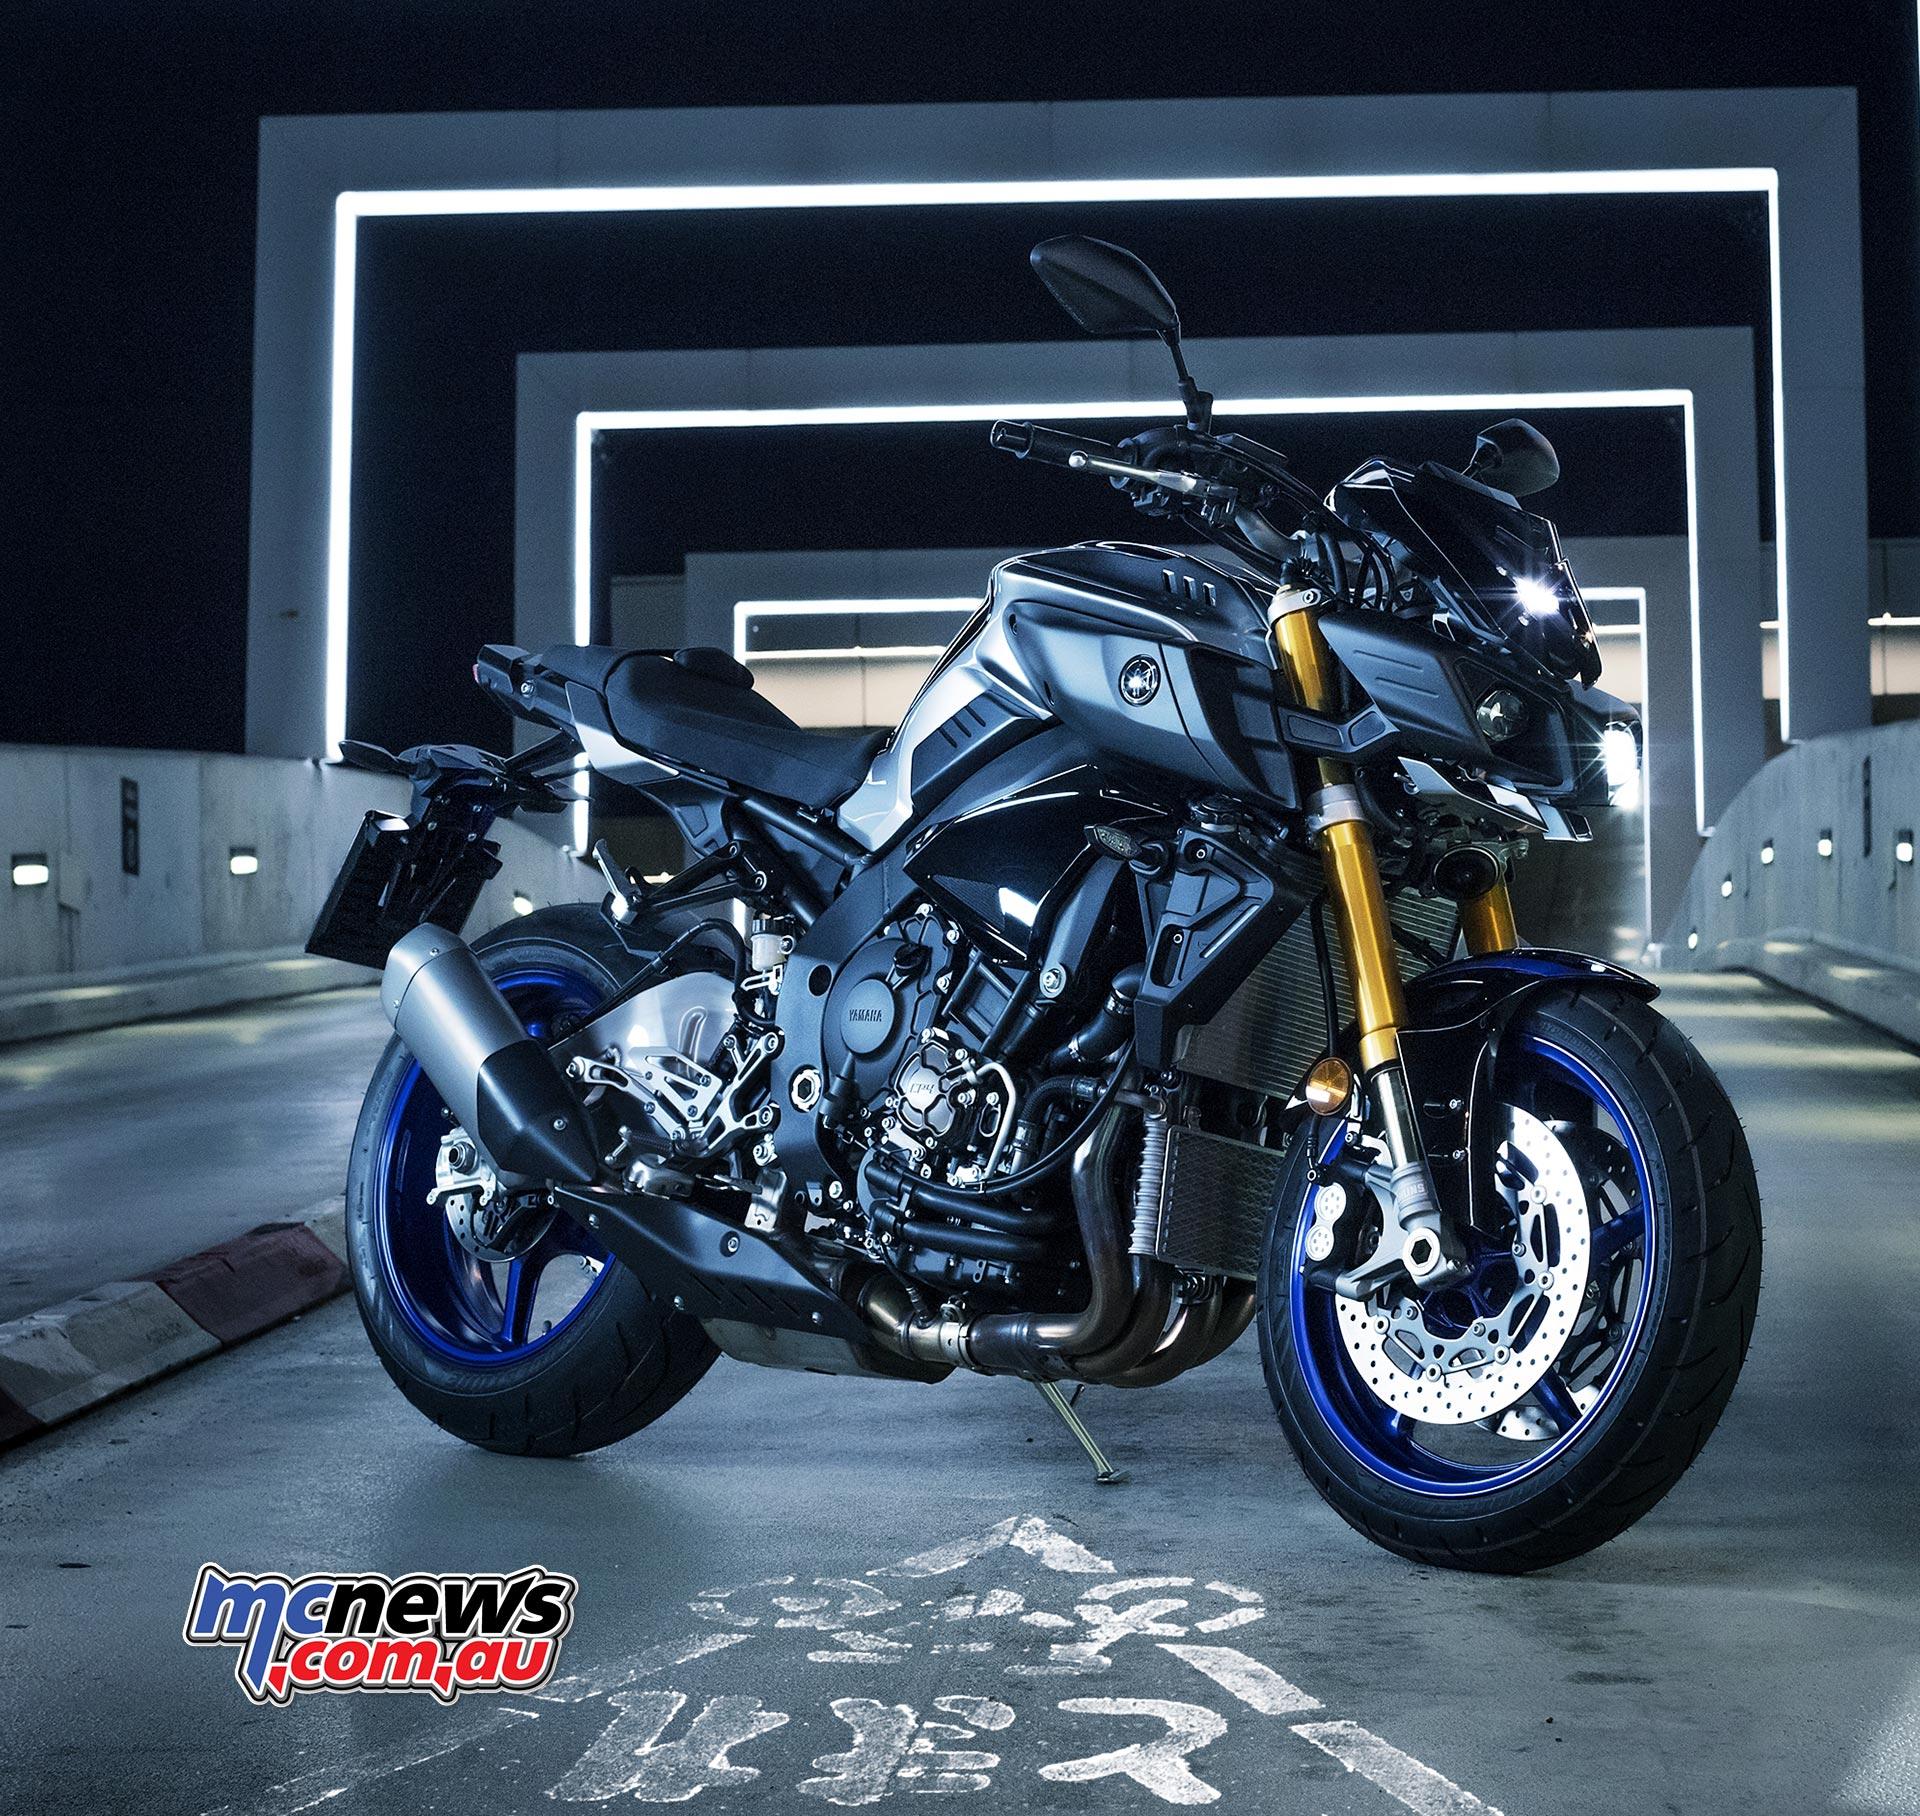 Black Live Wallpaper Yamaha Mt 10 Sp Gets Yzf R1m Supersport Tech Mcnews Com Au